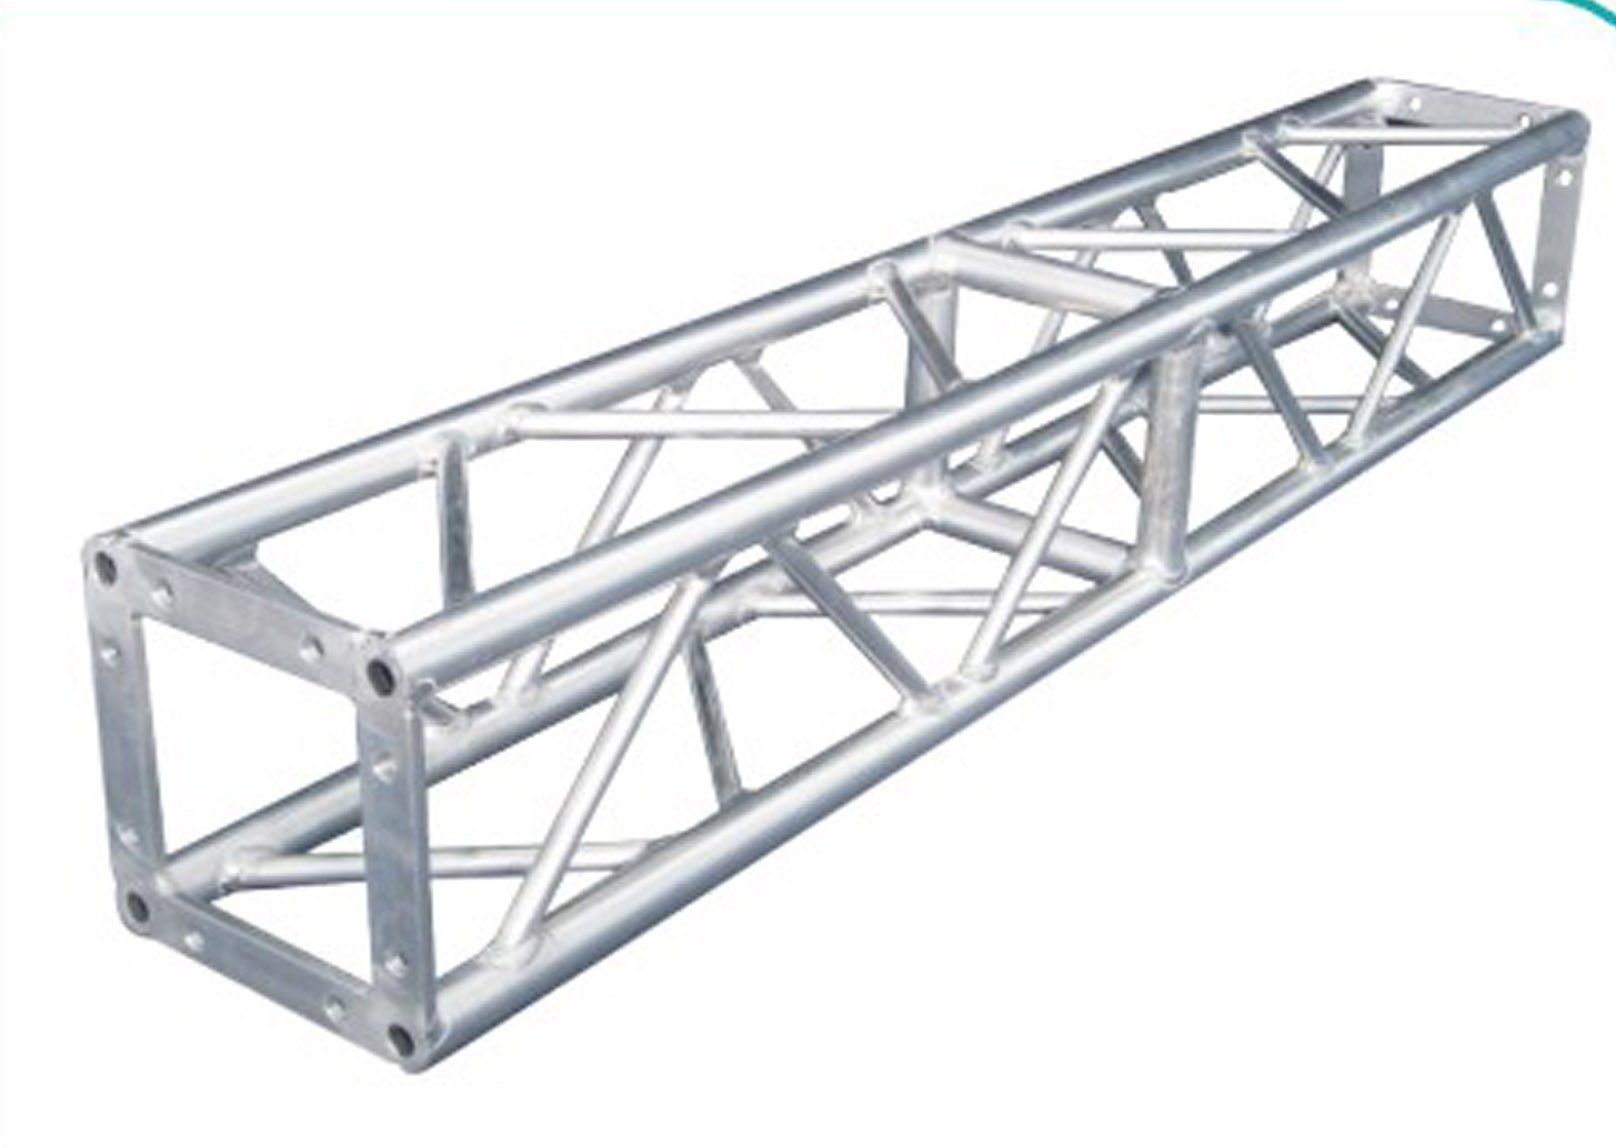 image stage truss vector royalty lighting outline metal free concert